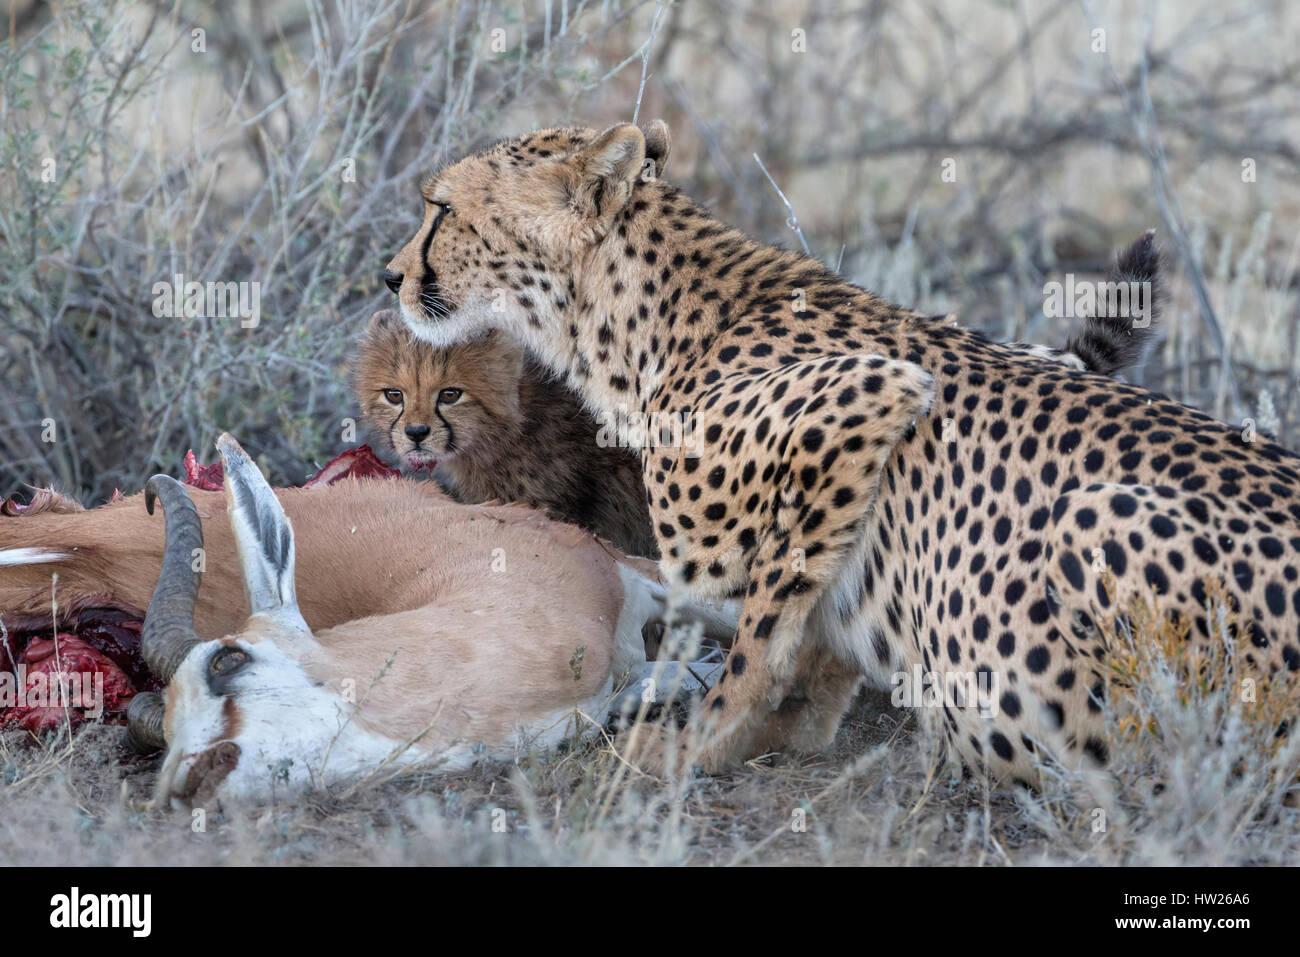 Cheetah (Acinonyx jubatus) with cub on springbok kill, Kgalagadi Transfronter Park, Northern Cape, South Africa, Stock Photo